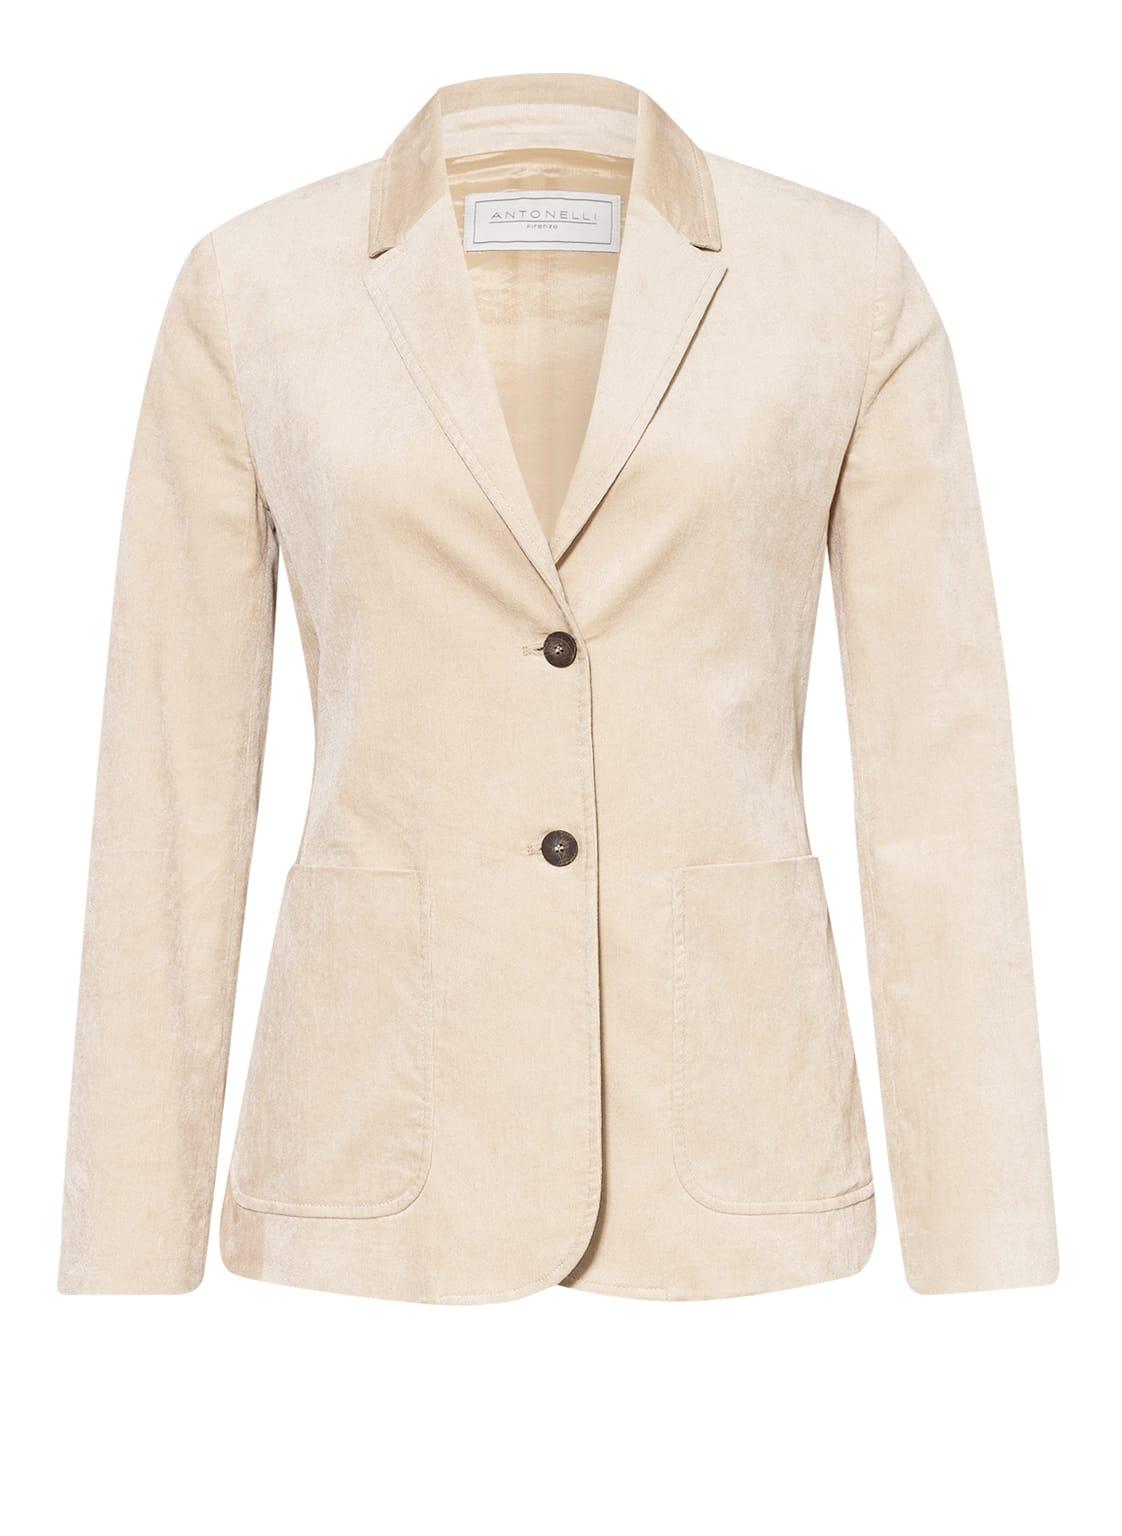 Image of Antonelli Firenze Blazer beige